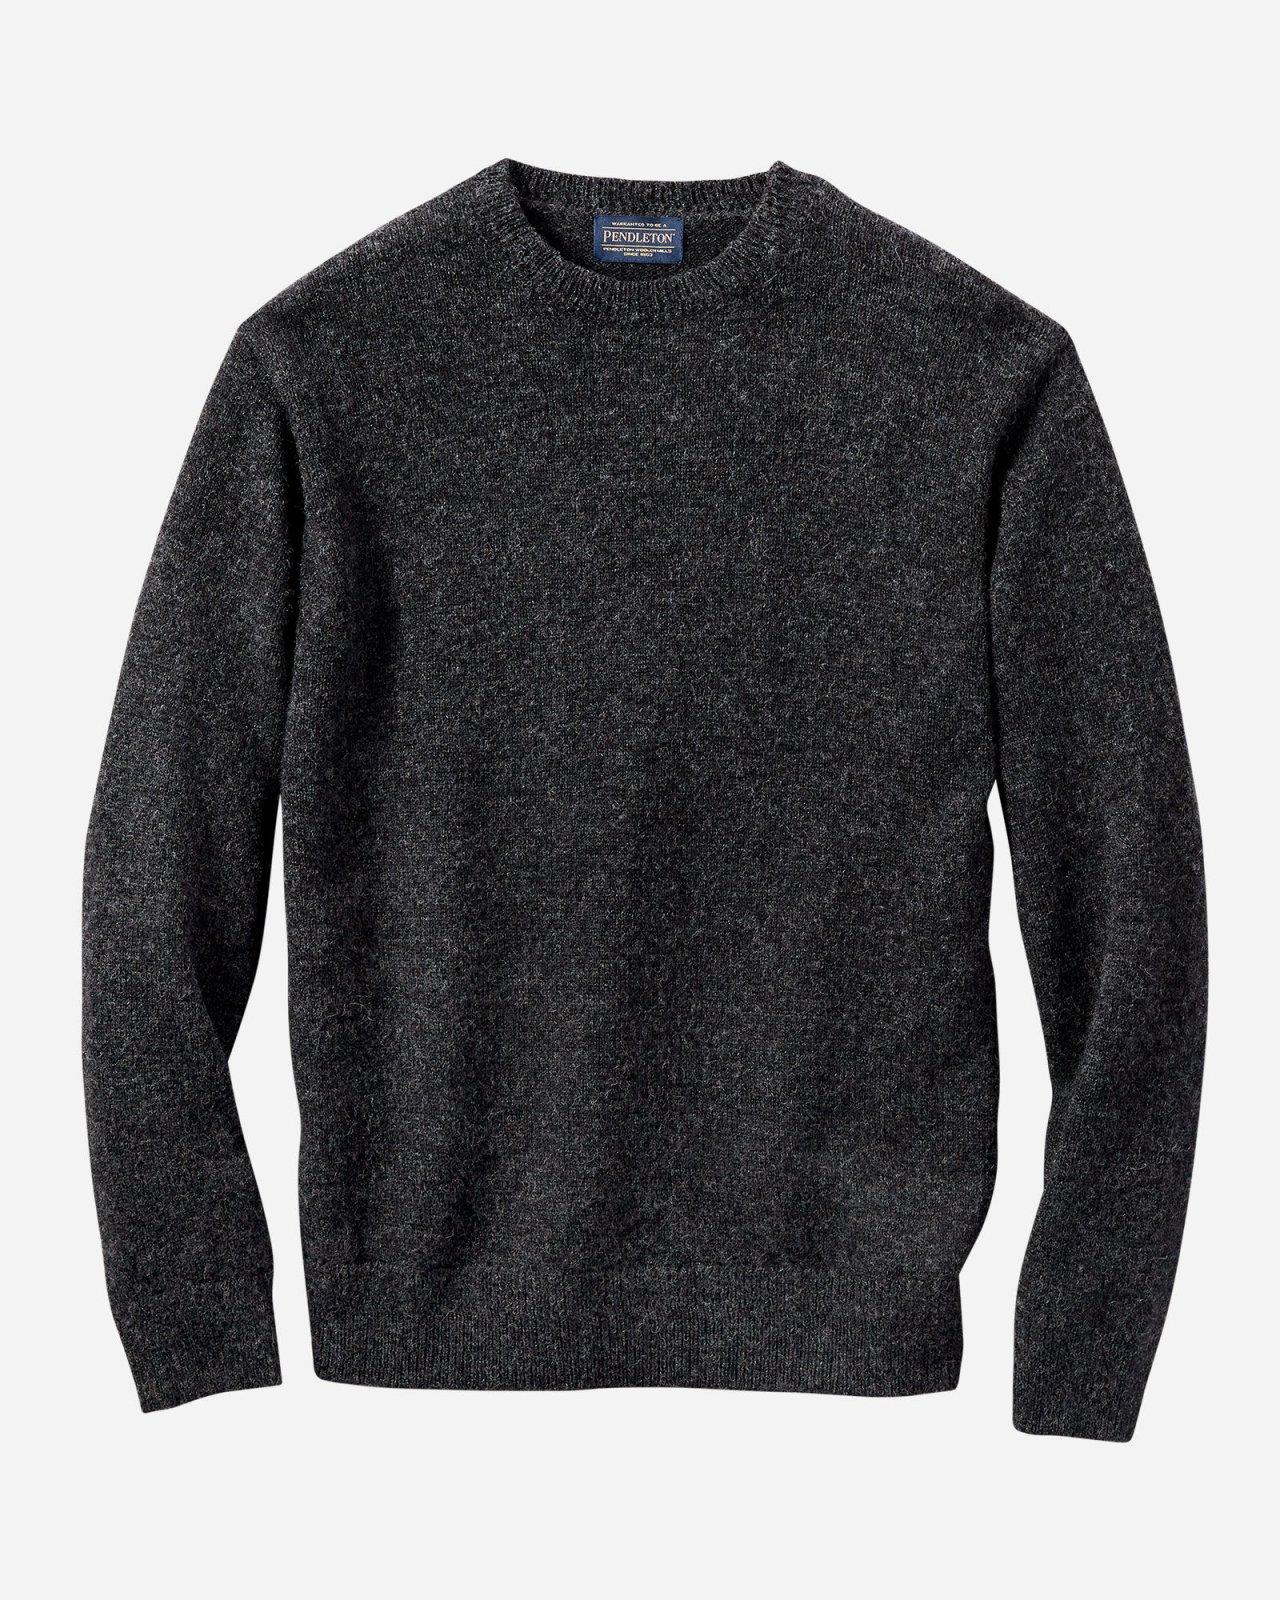 M's Pendleton Shetland Crew Sweater in Charcoal